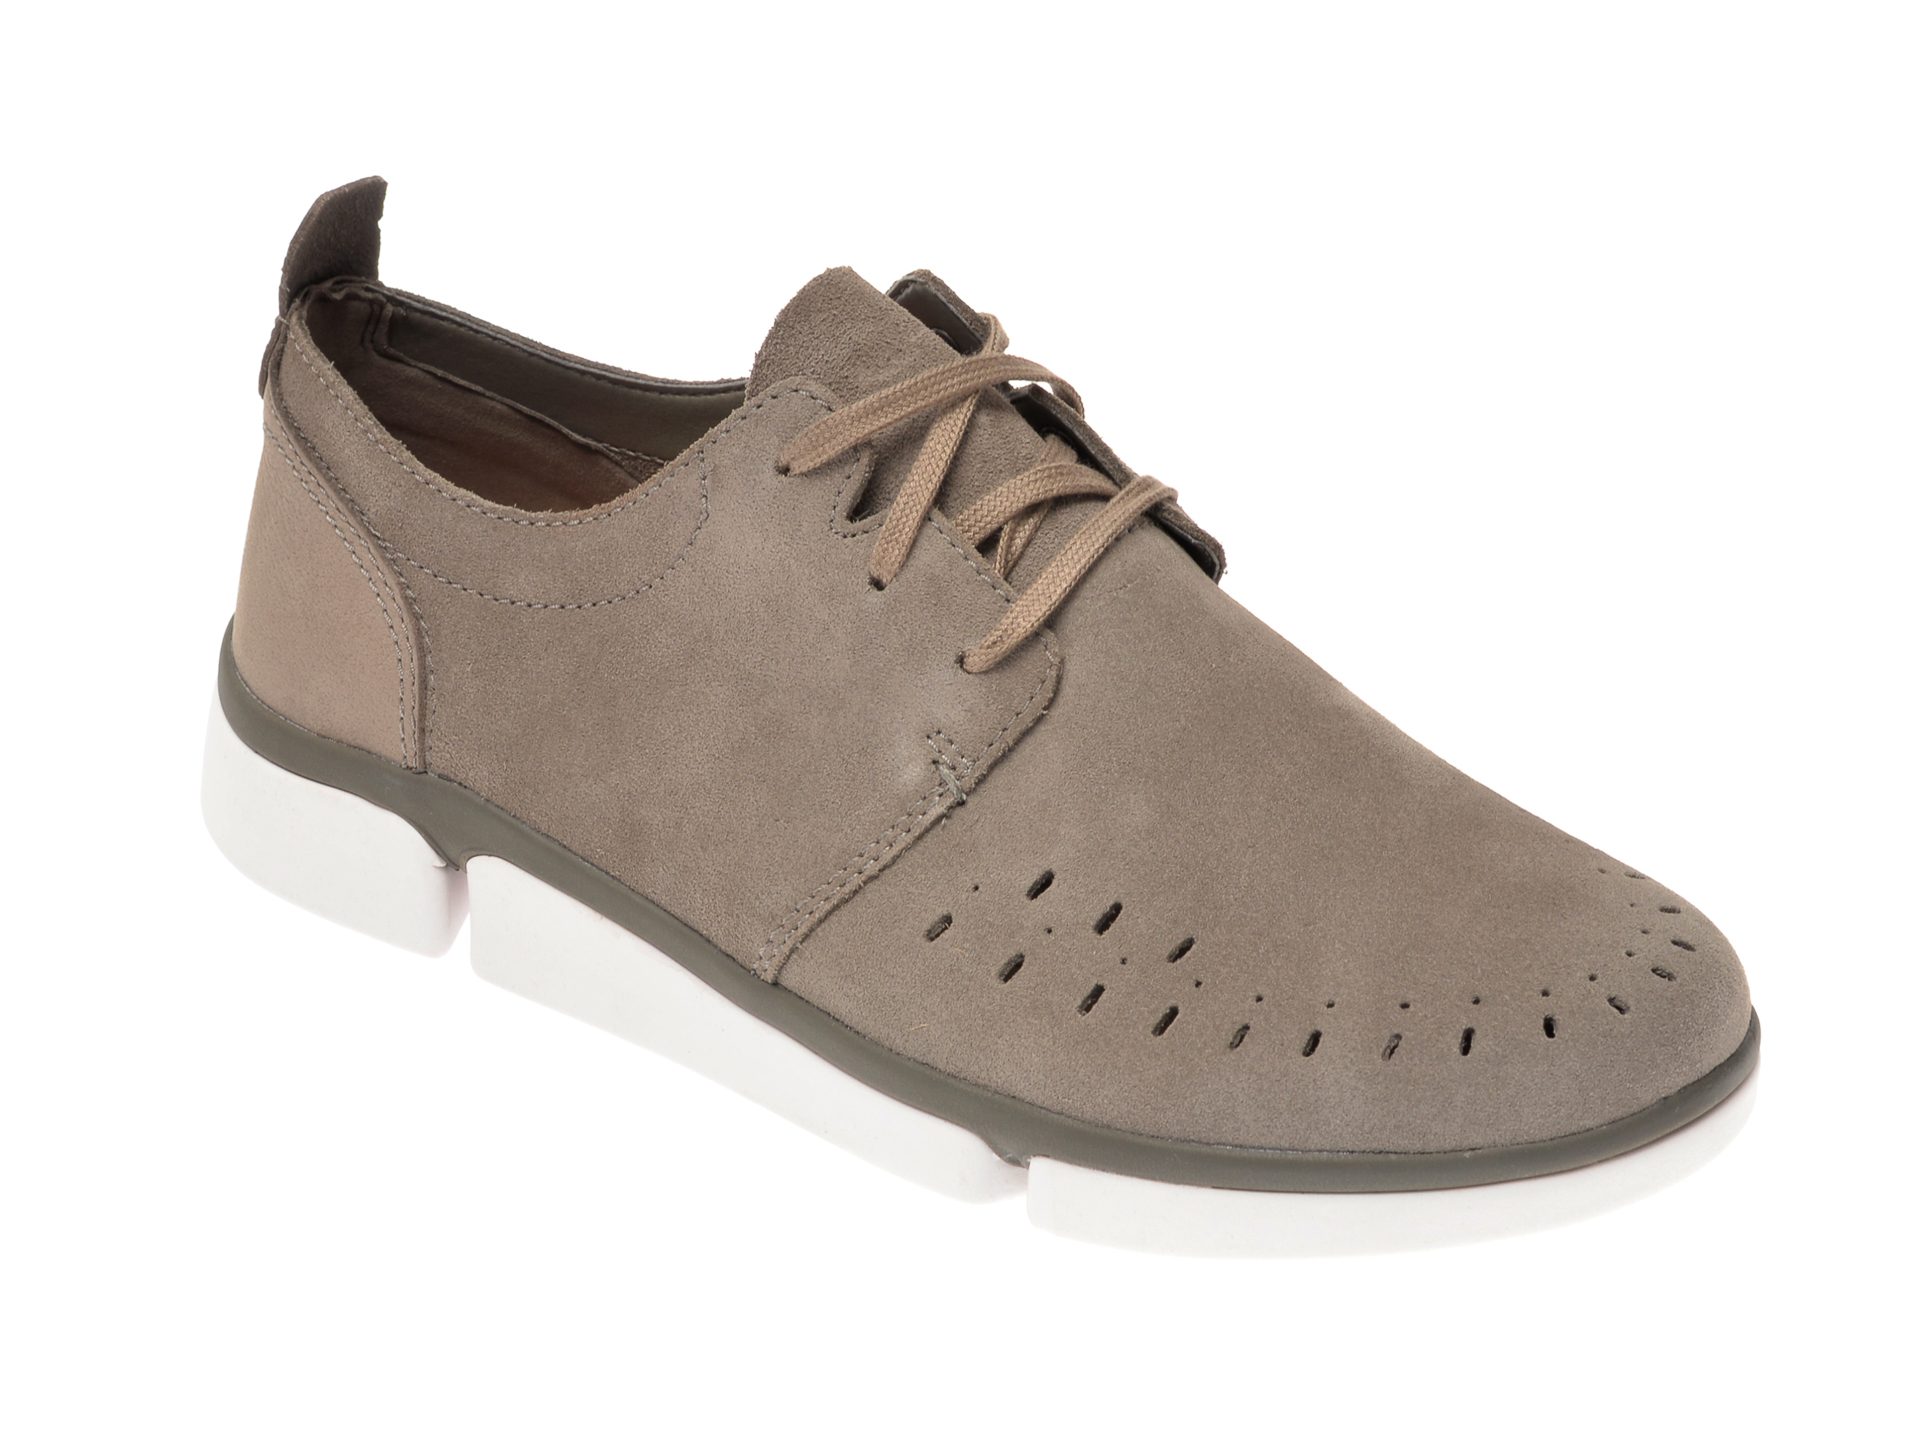 Pantofi CLARKS kaki, Tri Verve Boss, din piele intoarsa imagine